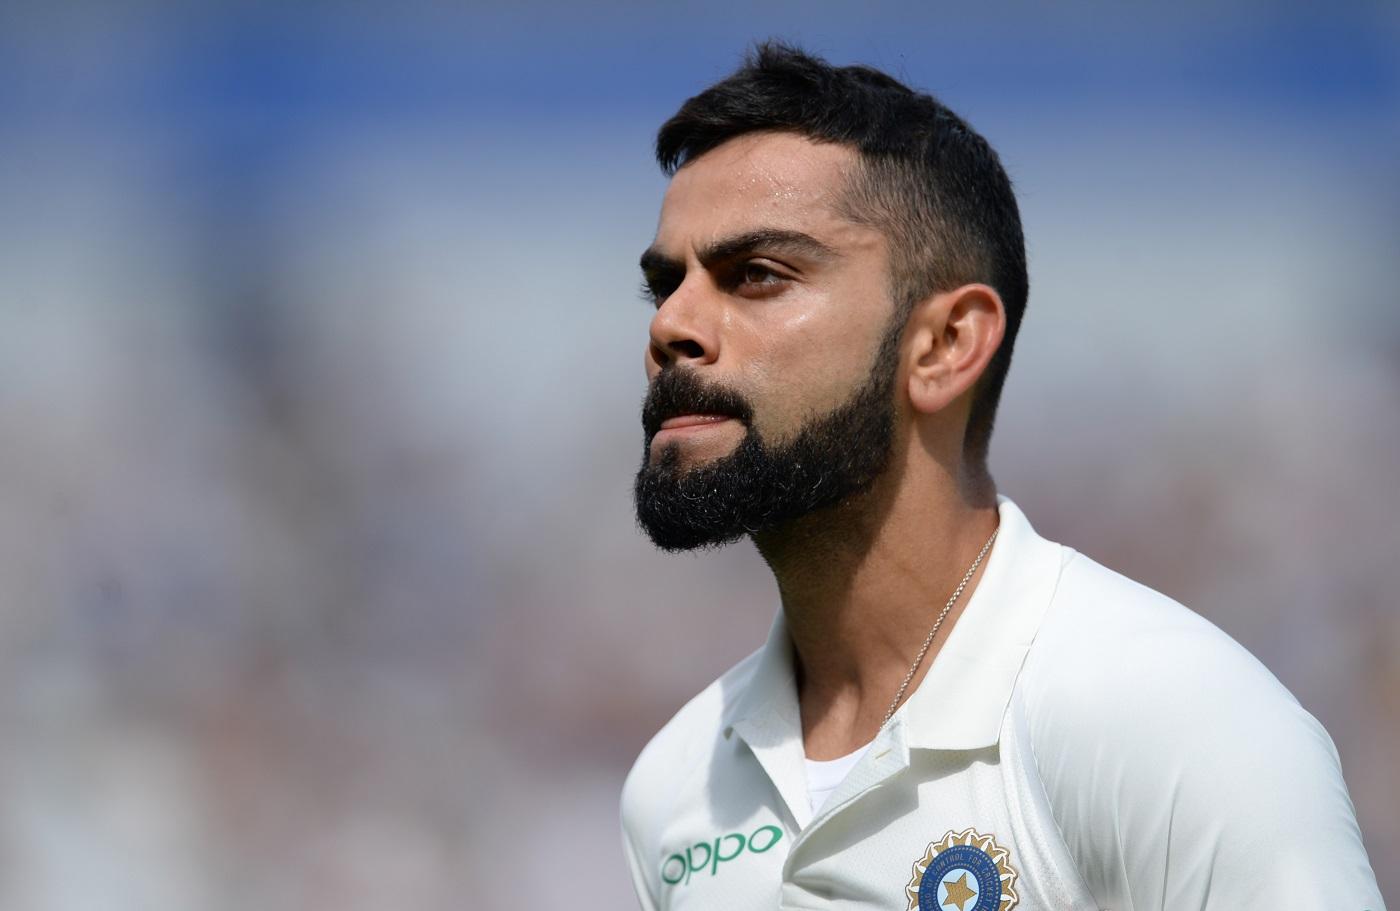 England vs India, Virat Kohli, Ollie Pope